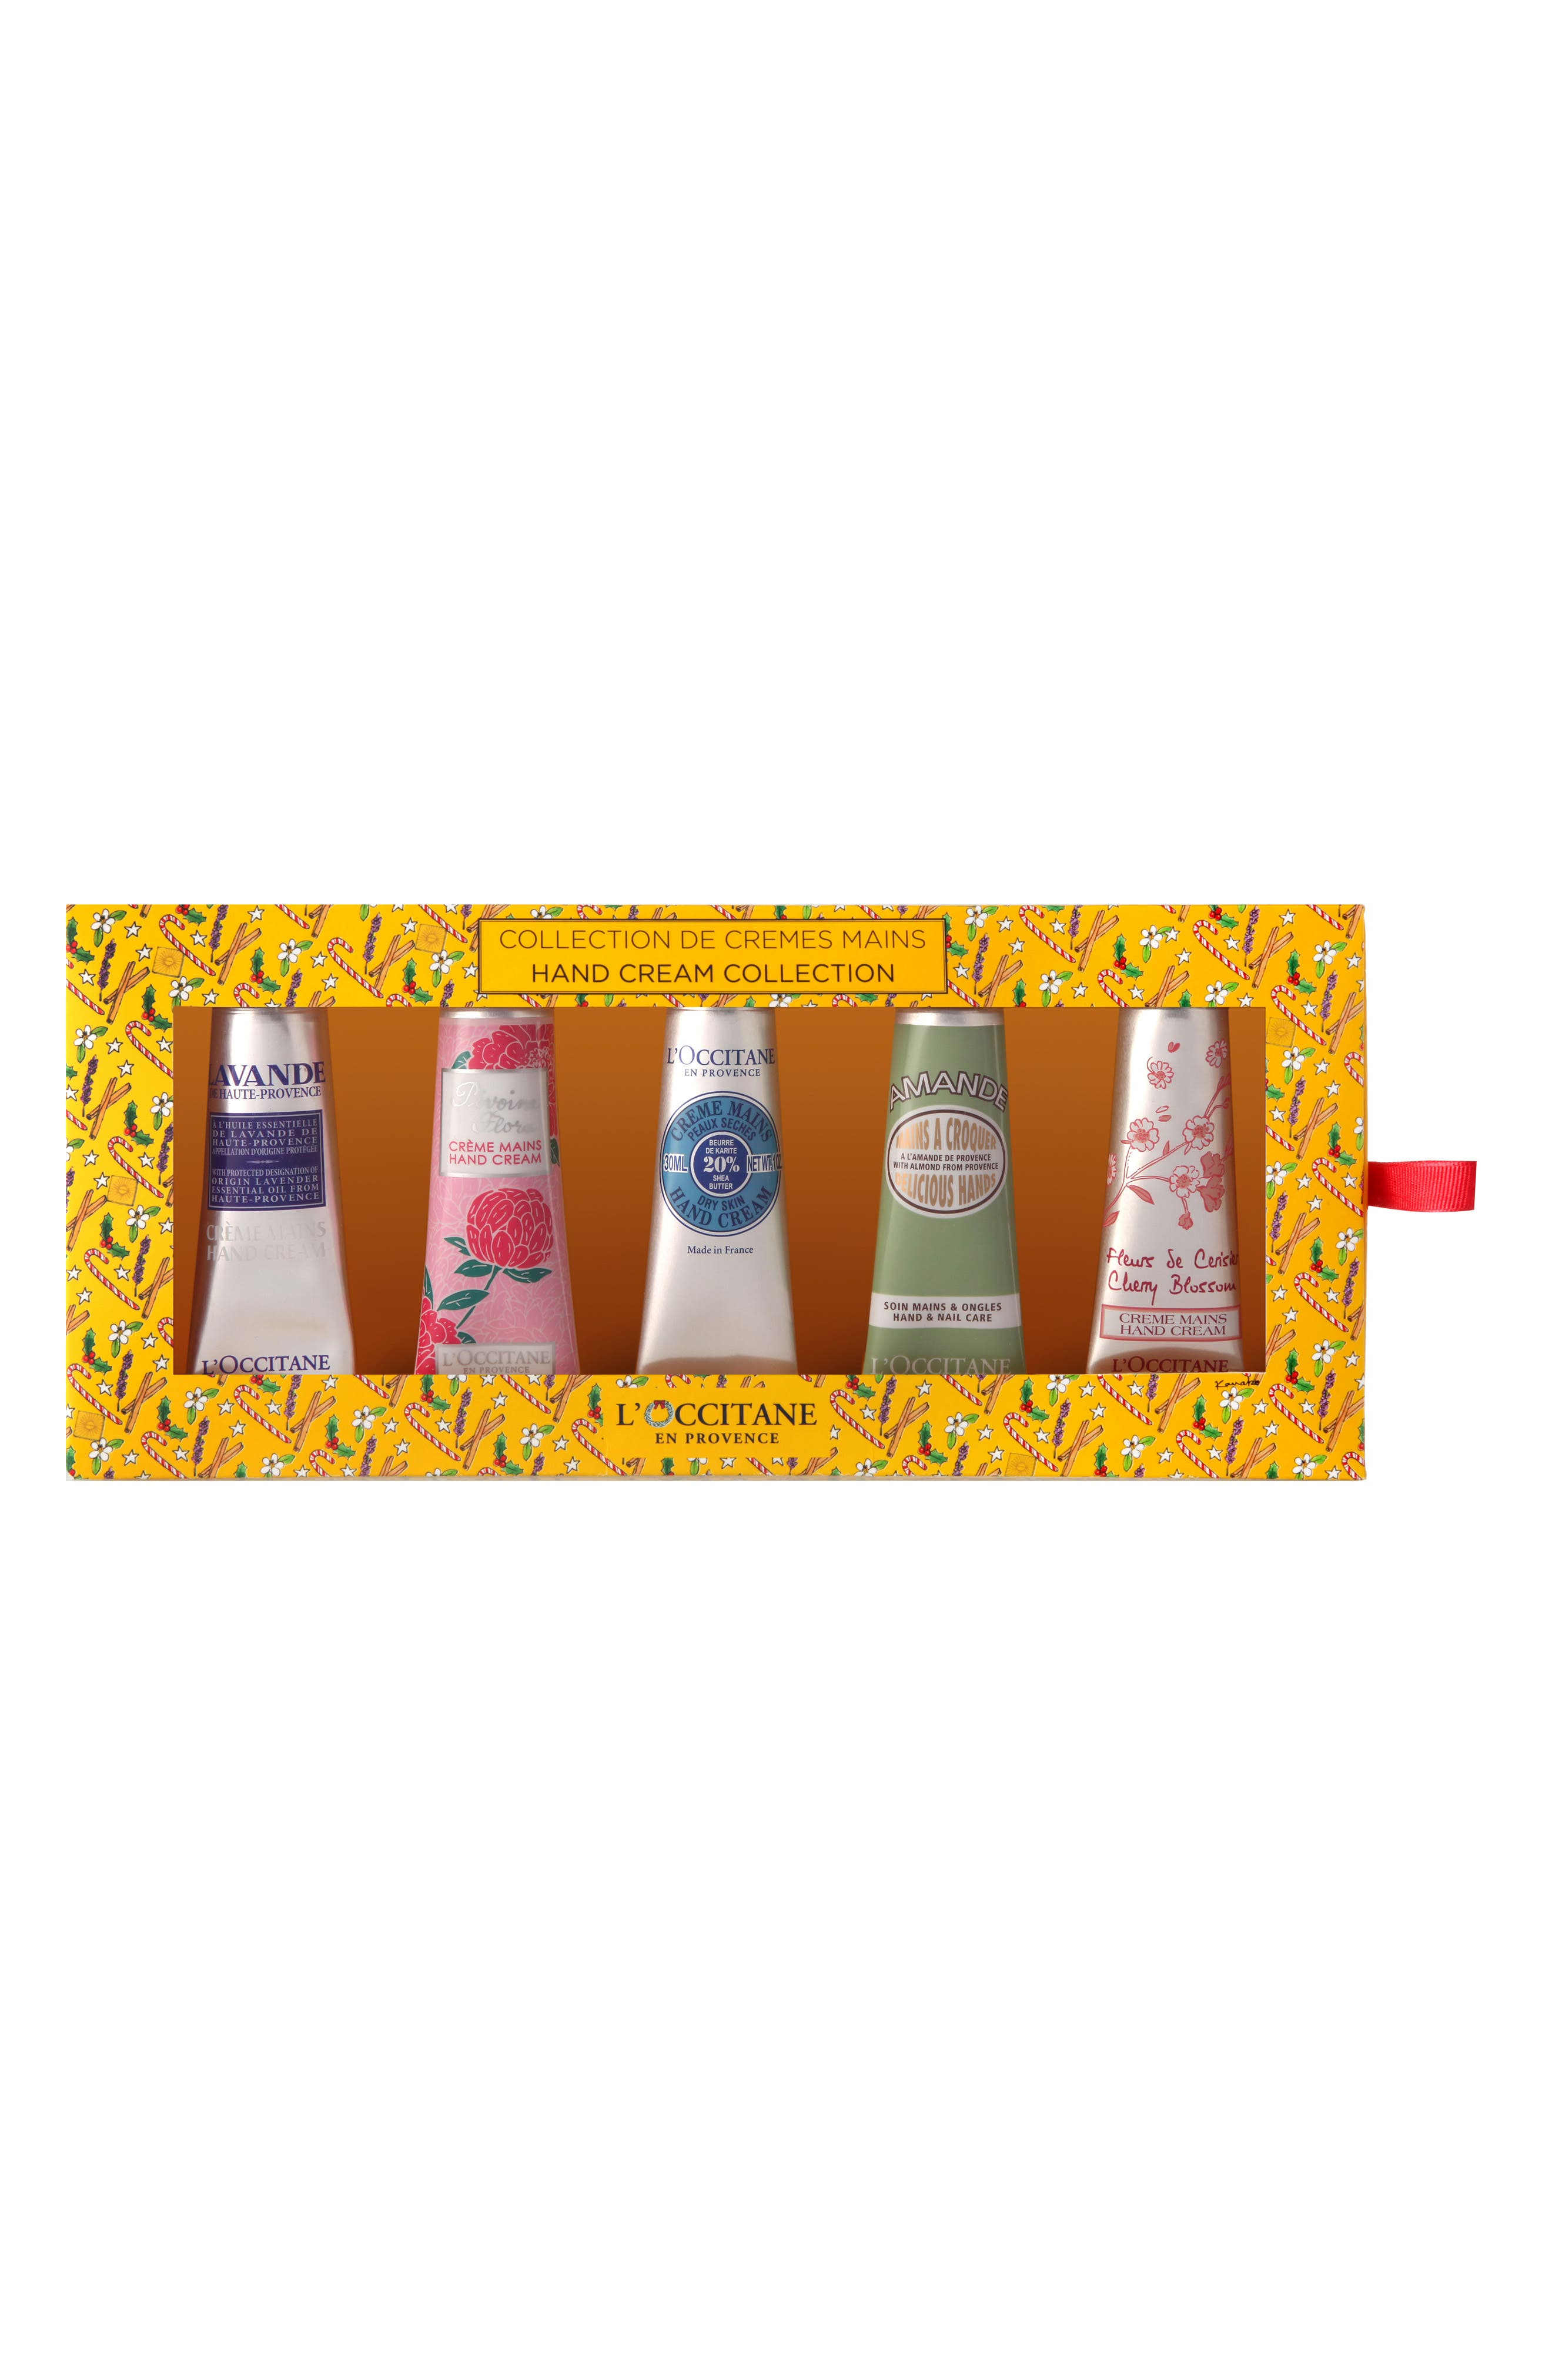 Alternate Image 1 Selected - L'Occitane Hand Cream Collection ($60 Value)